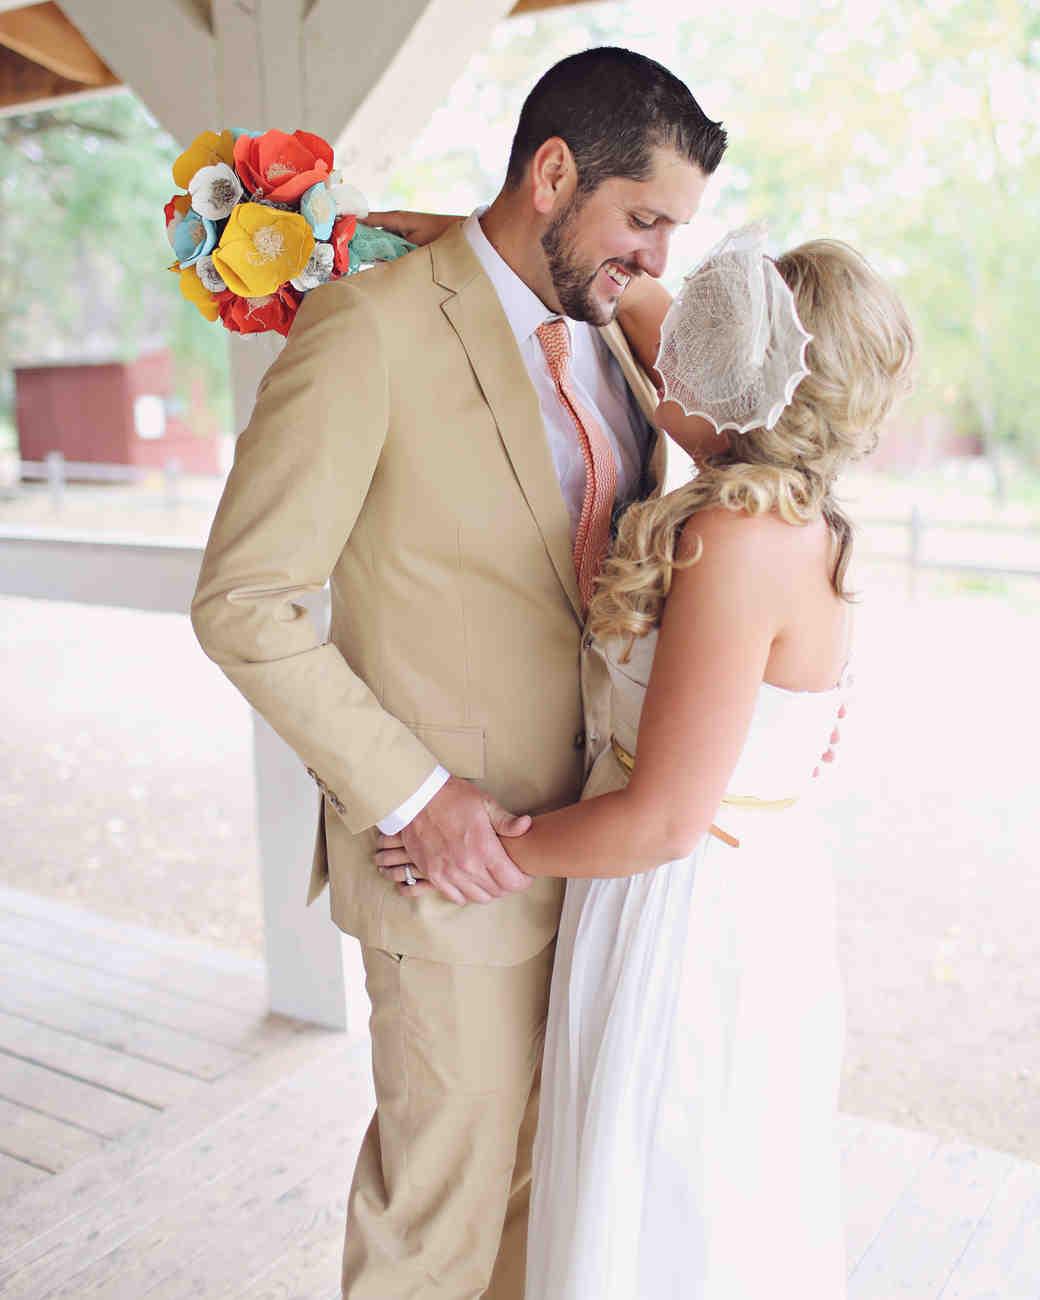 real-weddings-nichole-matthew-wd0413-116.jpg